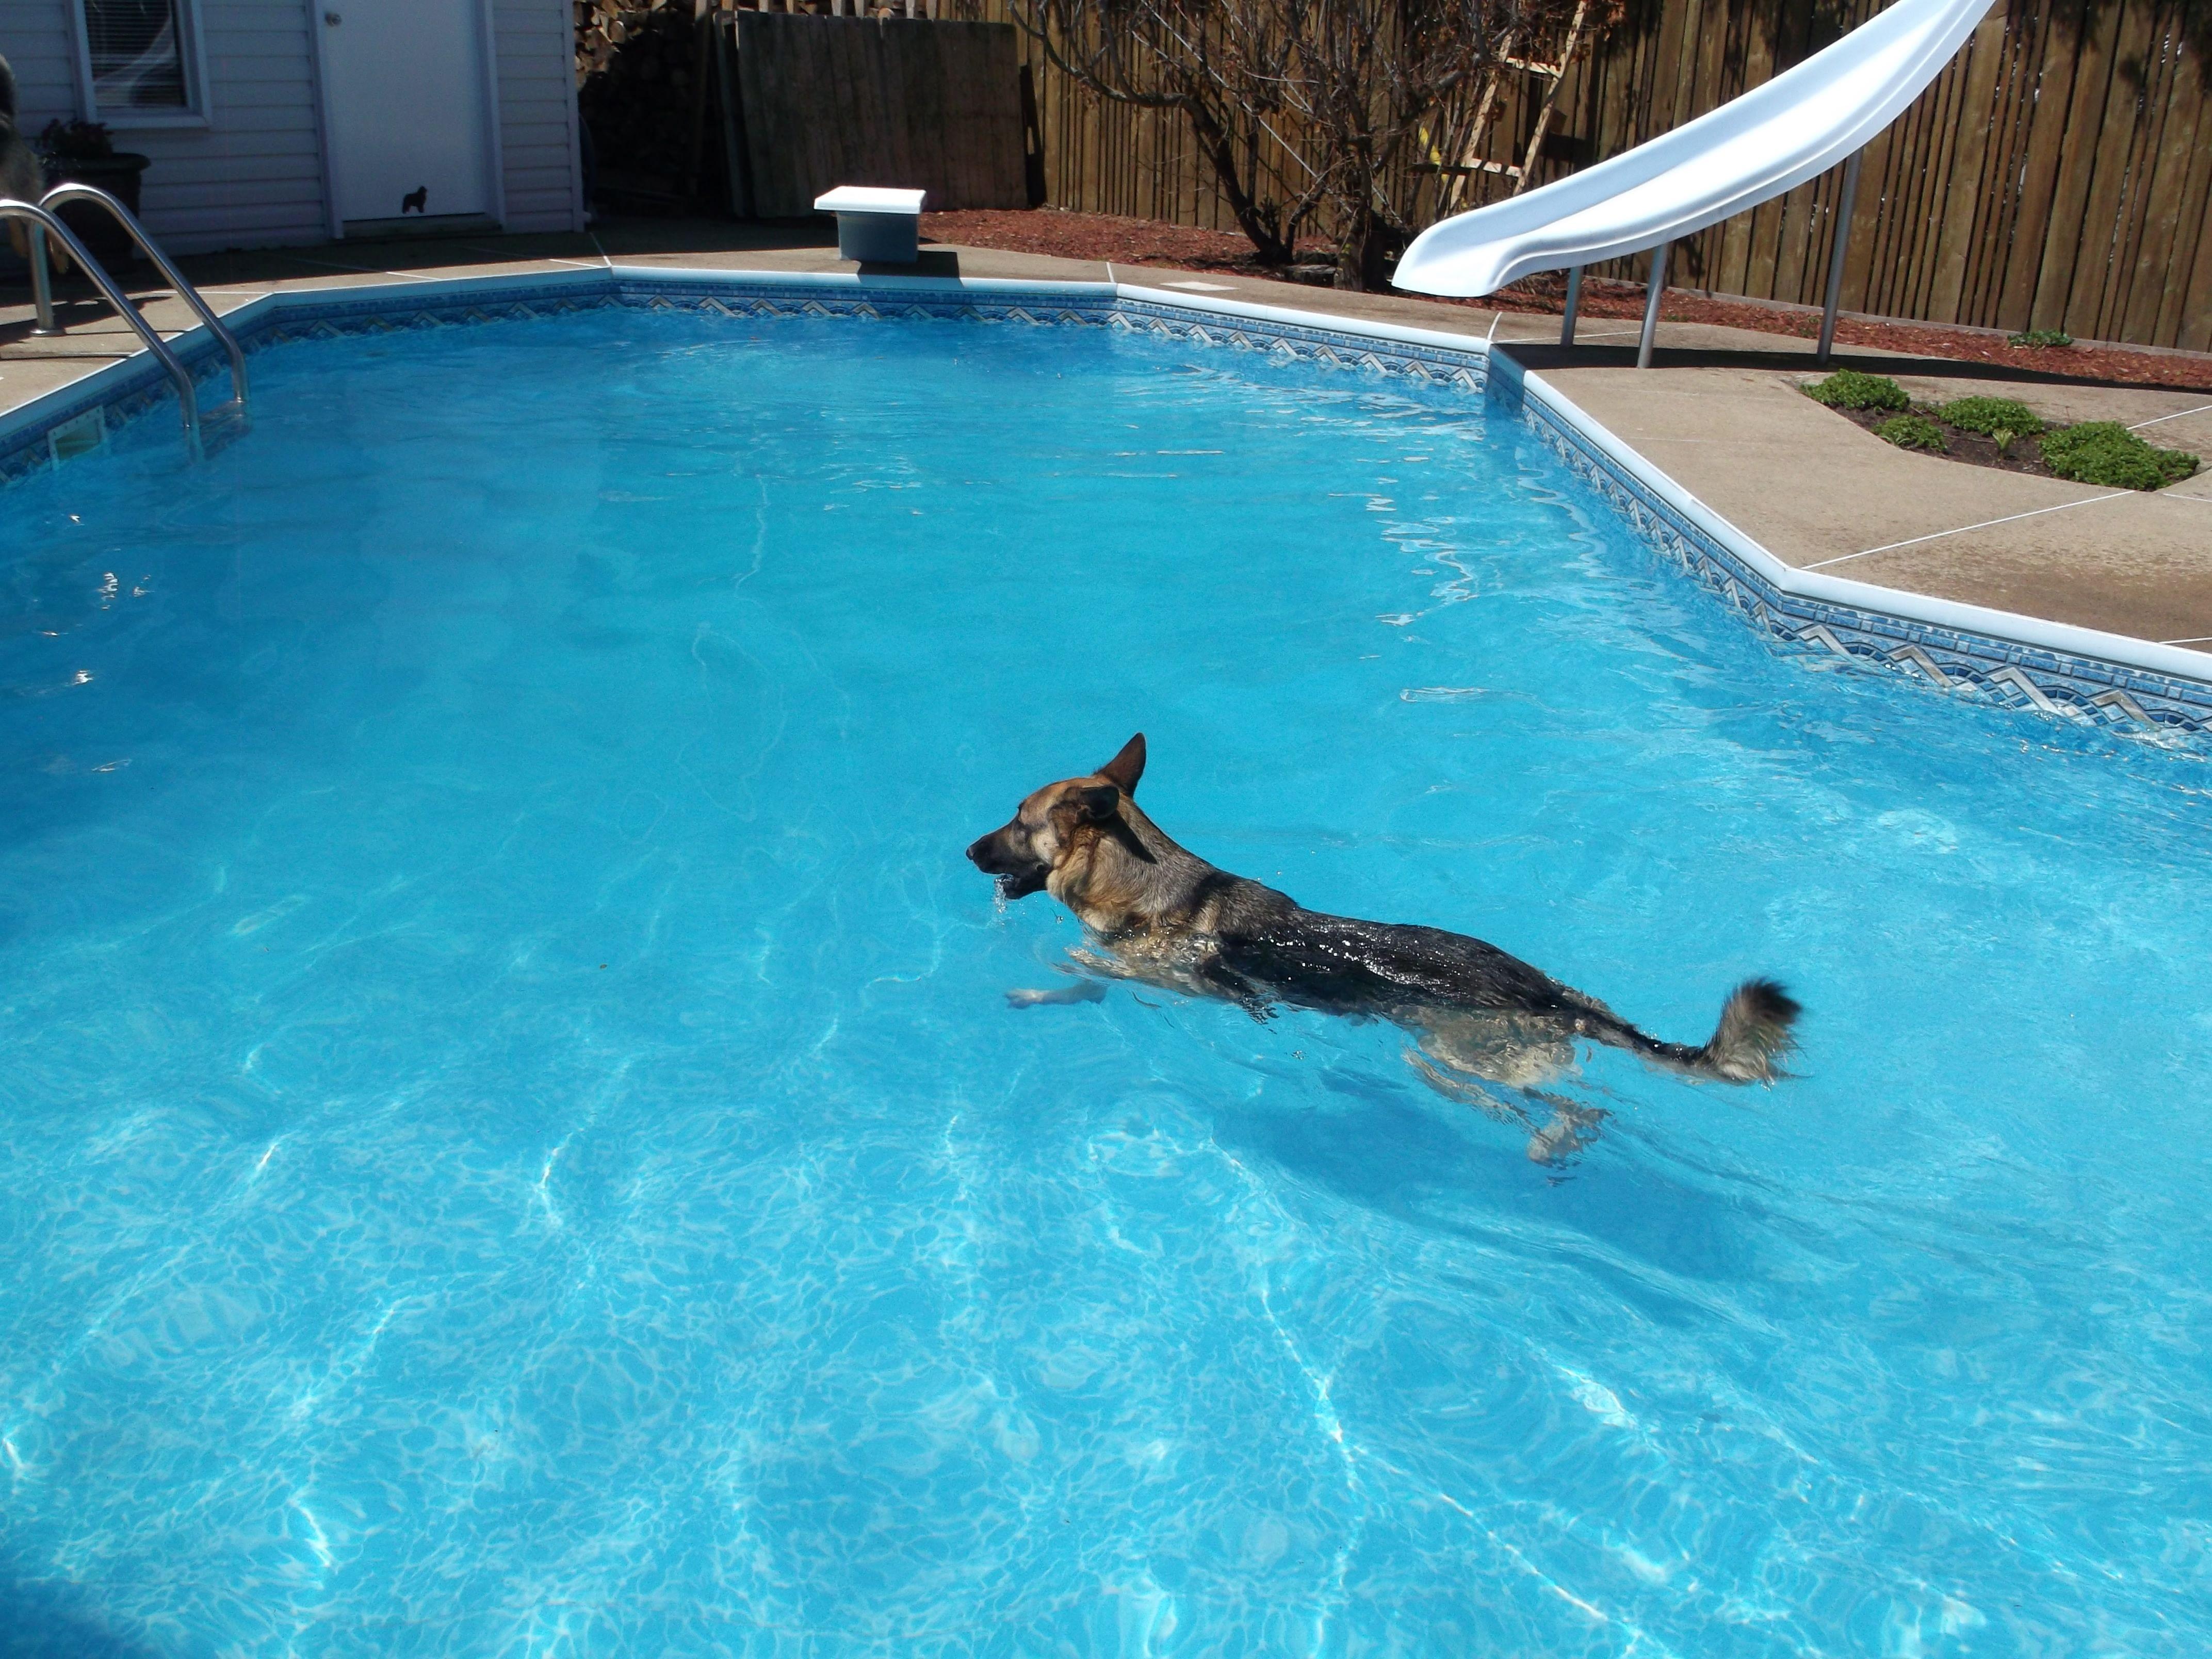 A German Shepherd Dog Is Swimming In A Pool German Shepherd Dogs German Shepherd Training German Shepherd Puppies